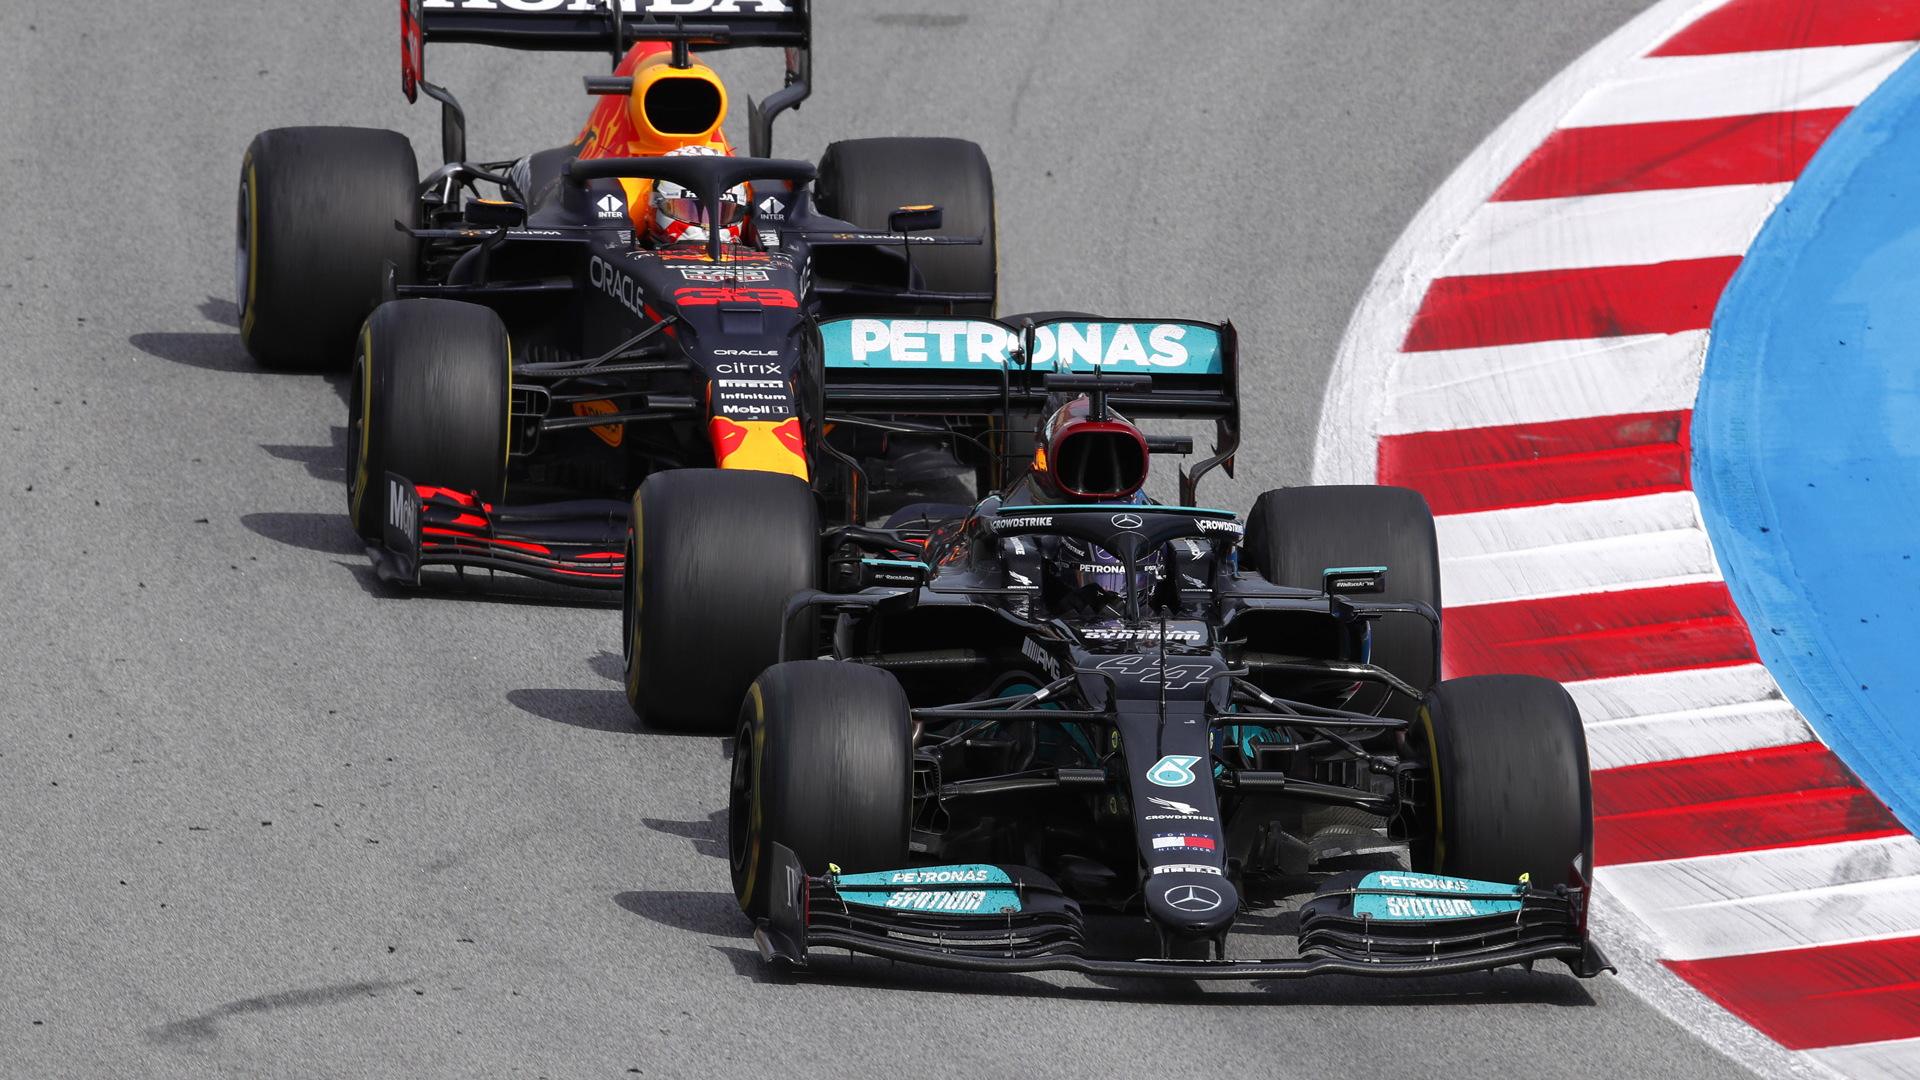 Mercedes-Benz AMG's Lewis Hamilton at the 2021 Formula One Spanish Grand Prix